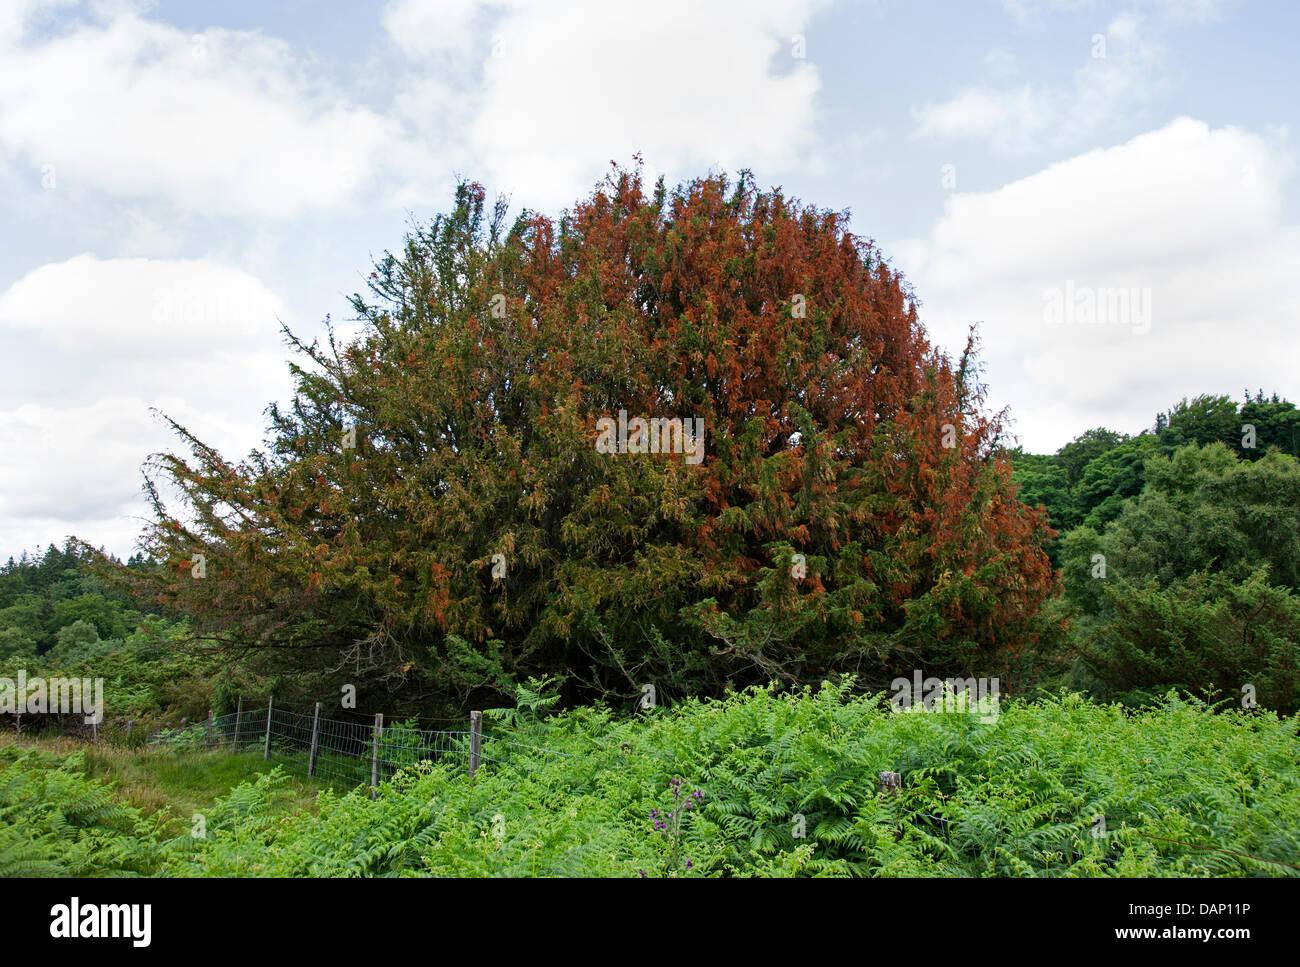 16 July 2013 Moor House National Nature Reserve in Upper Teesdale County Durham UK.  Juniper Tree Juniperus communis - Stock Image